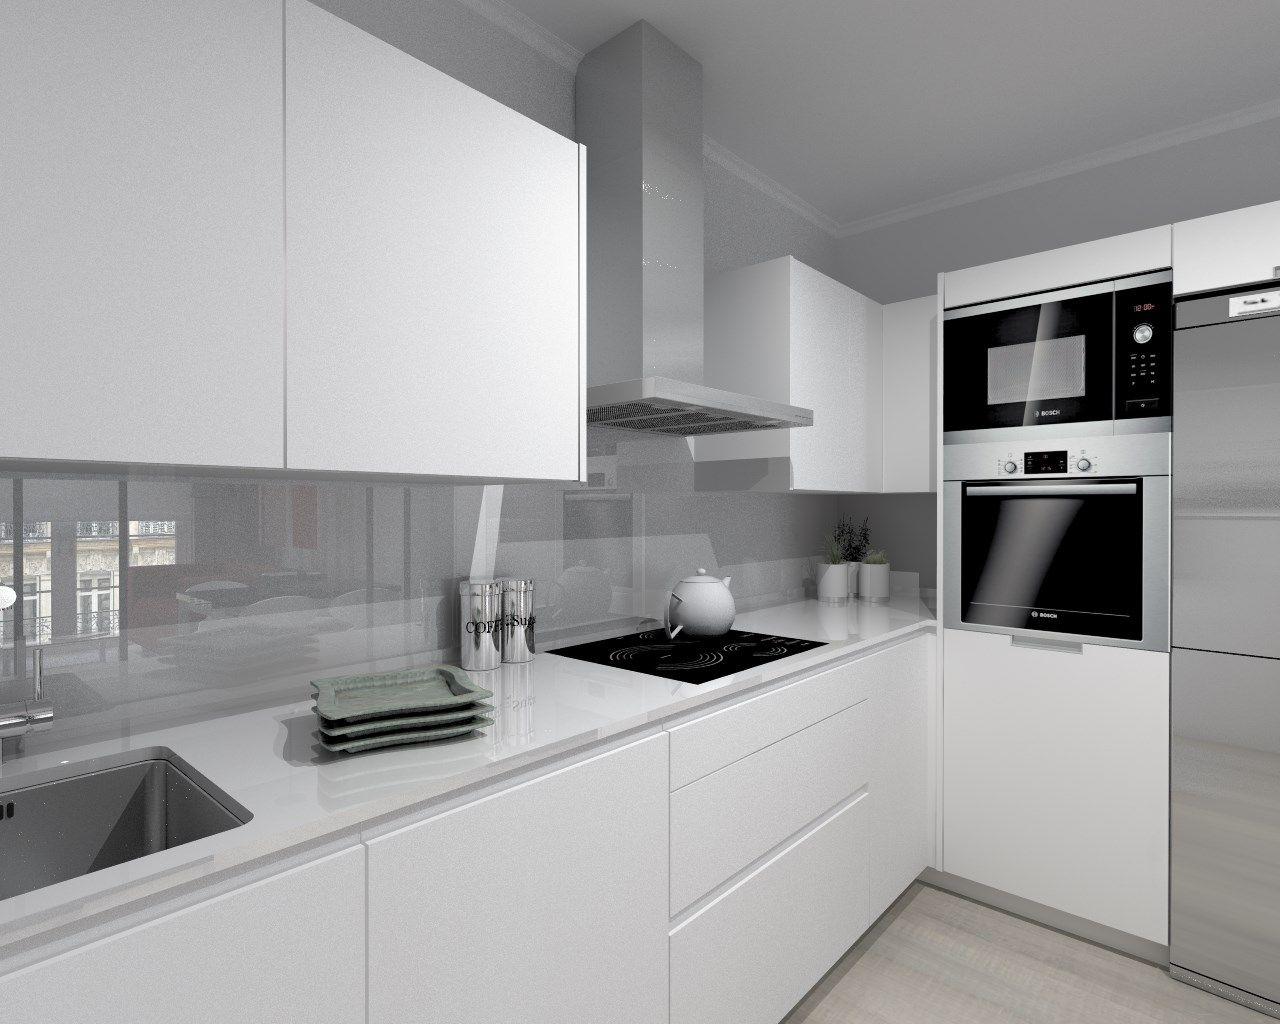 Cocina santos modelo line estratificado blanco encimera for Cocinas alargadas modernas